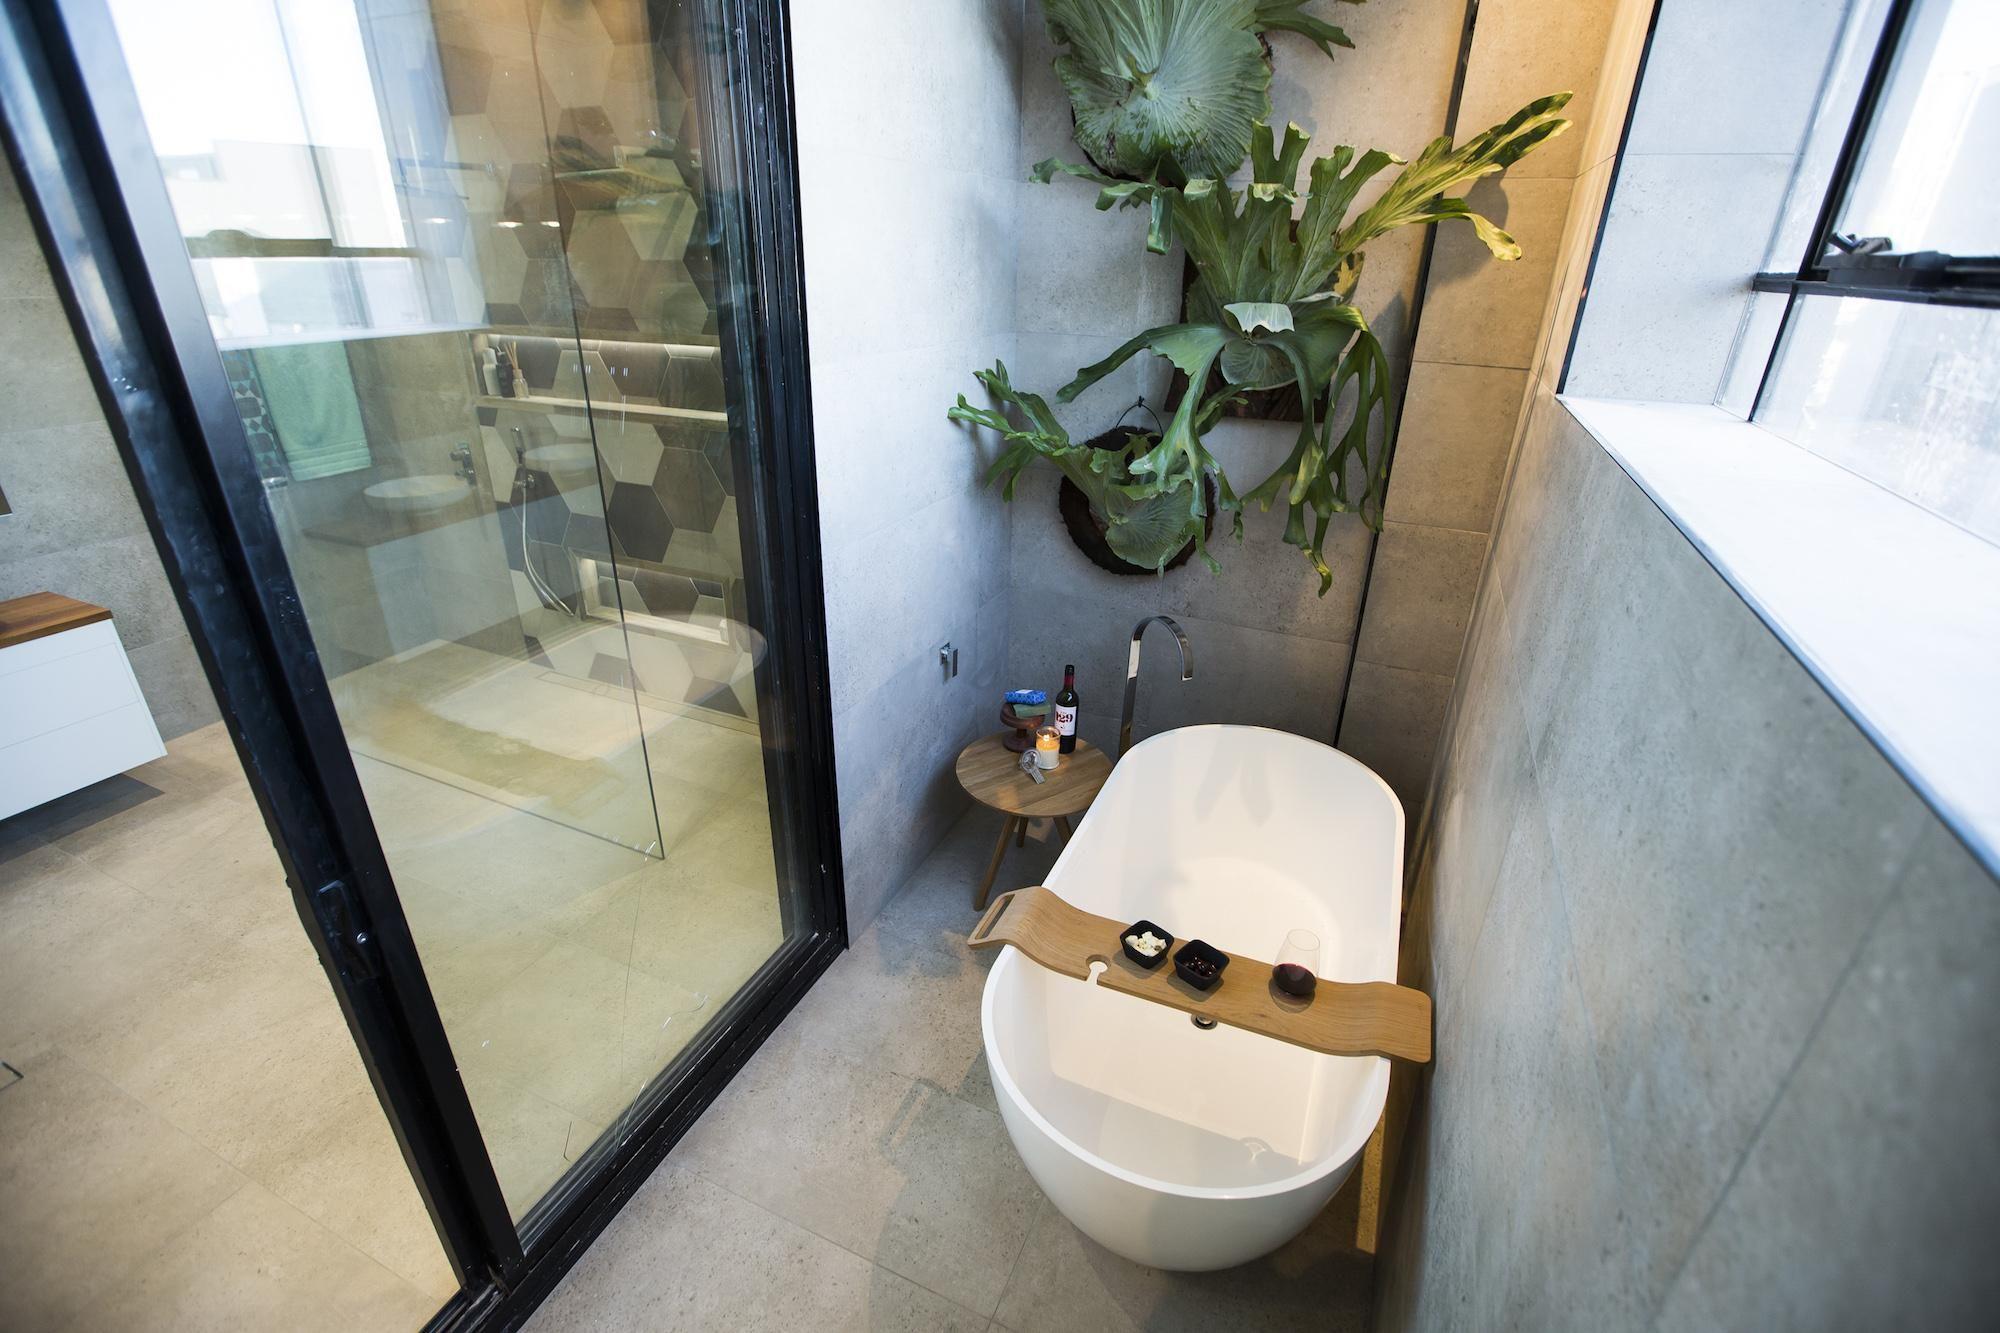 Kim U0026 Chris Week 9   Loggia U0026 Redo Bathroom